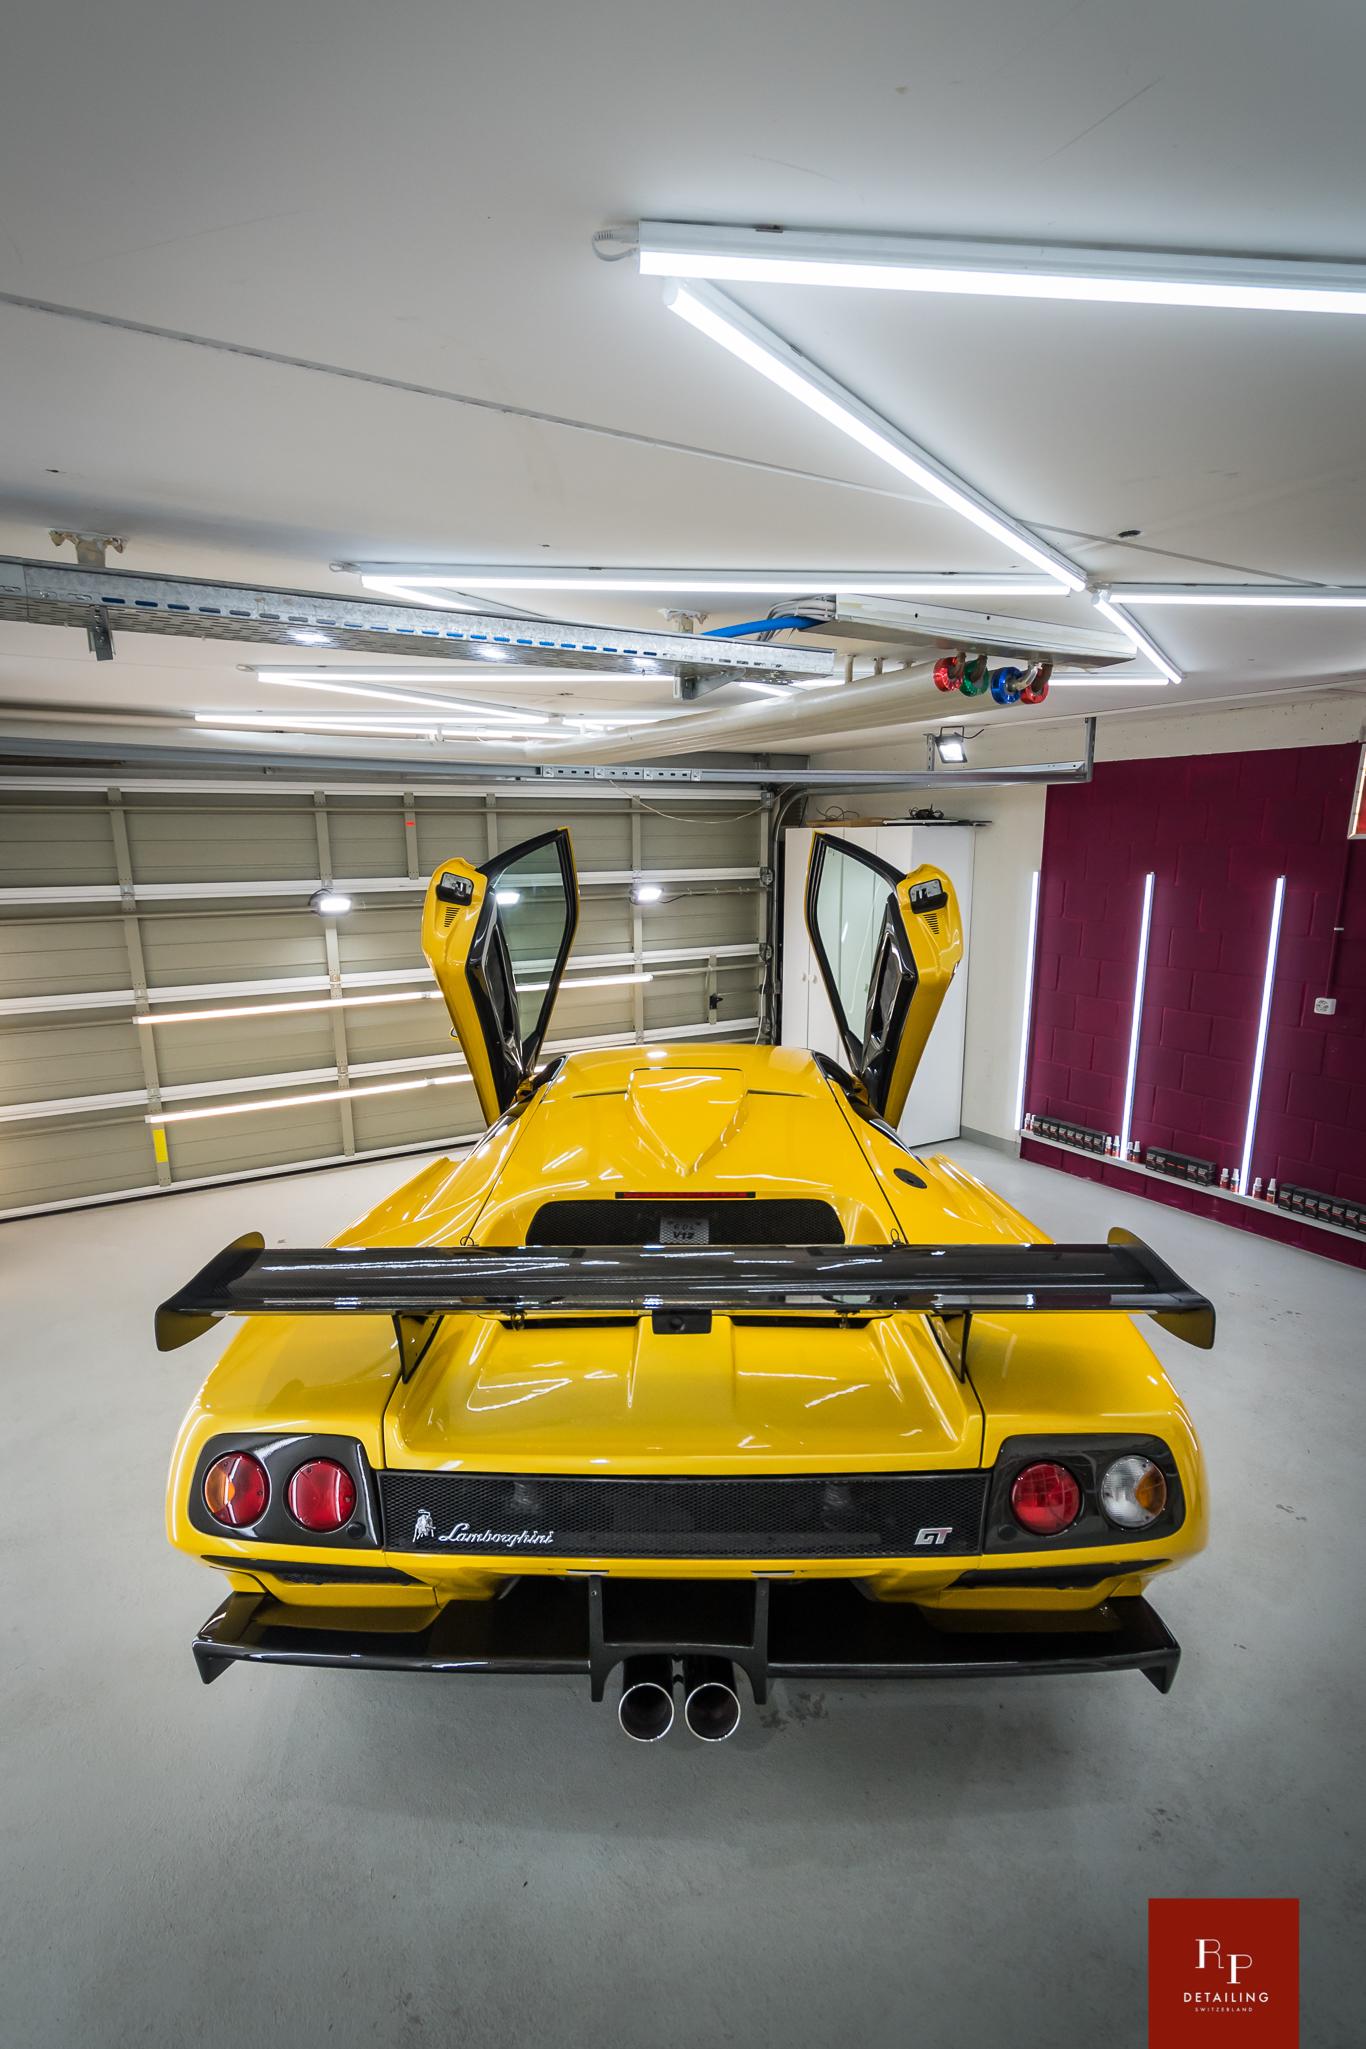 Lamborghini%20Diablo%20GT%20RP%2039.jpg